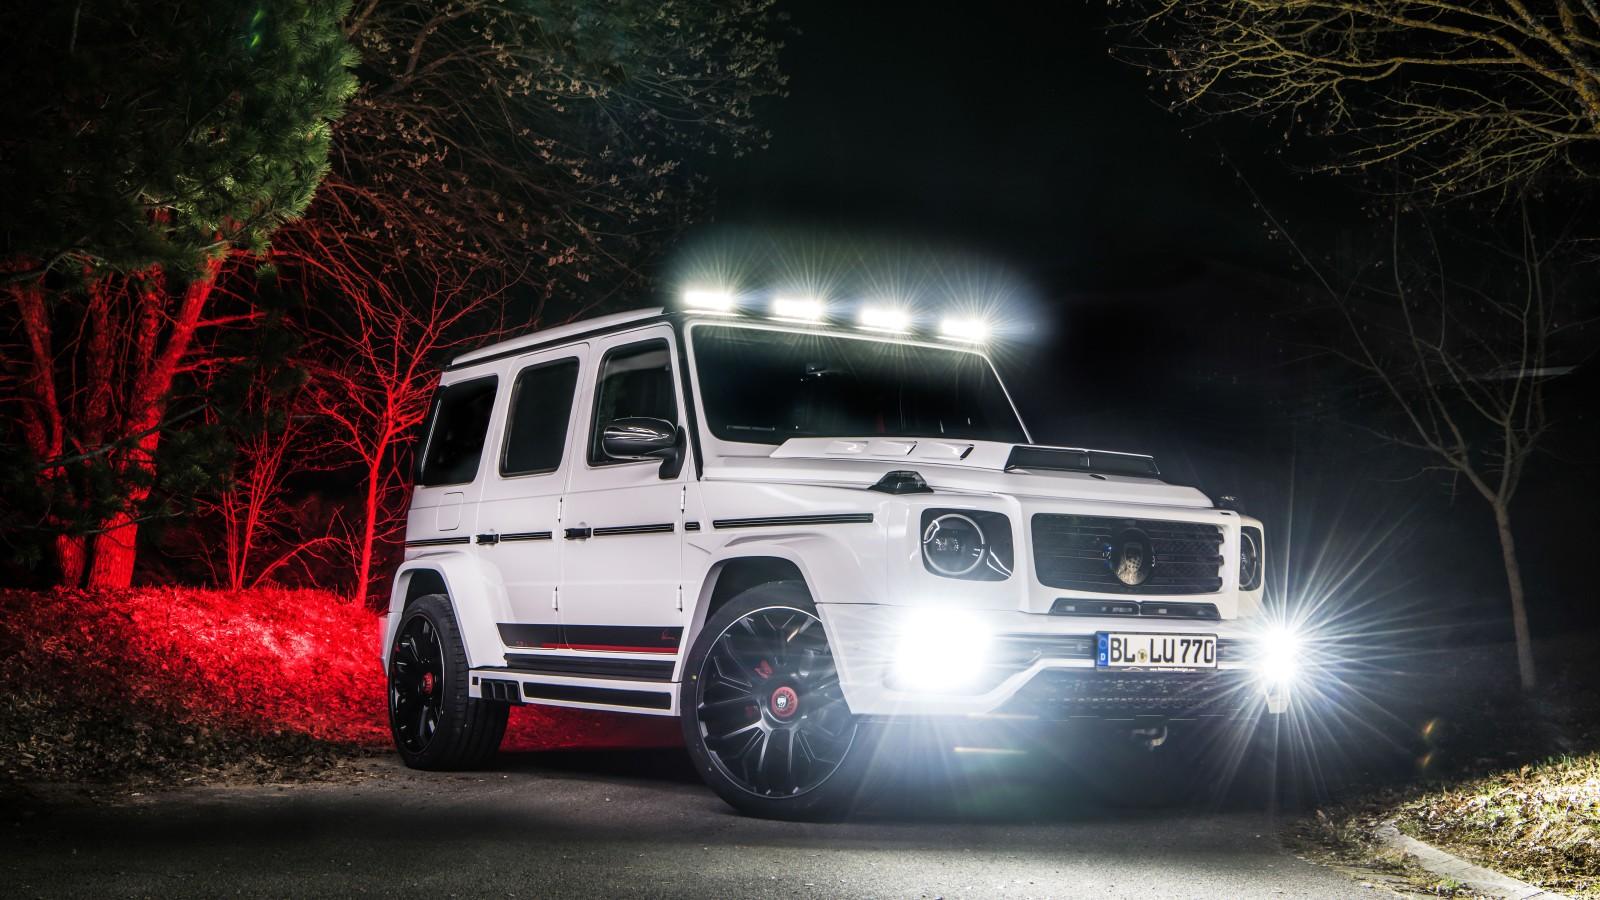 Mercedes G63 Amg 6X6 >> 2019 Mercedes-AMG G63 by Lumma Design LUMMA CLR G770 5K Wallpaper | HD Car Wallpapers | ID #12497